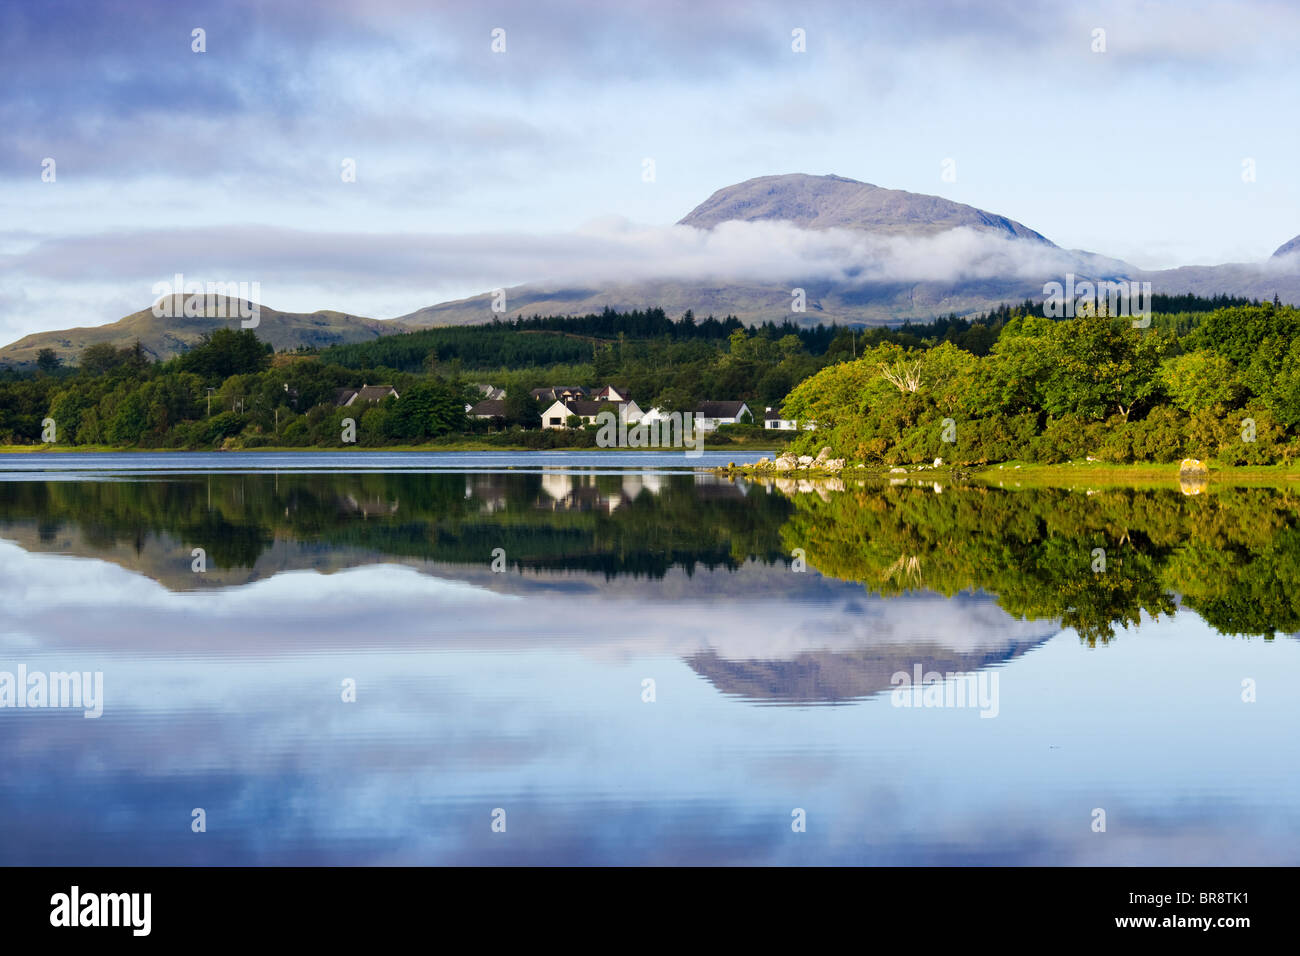 Loch Don, Lochdon, Isle of Mull, Argyll, Scotland, UK. - Stock Image